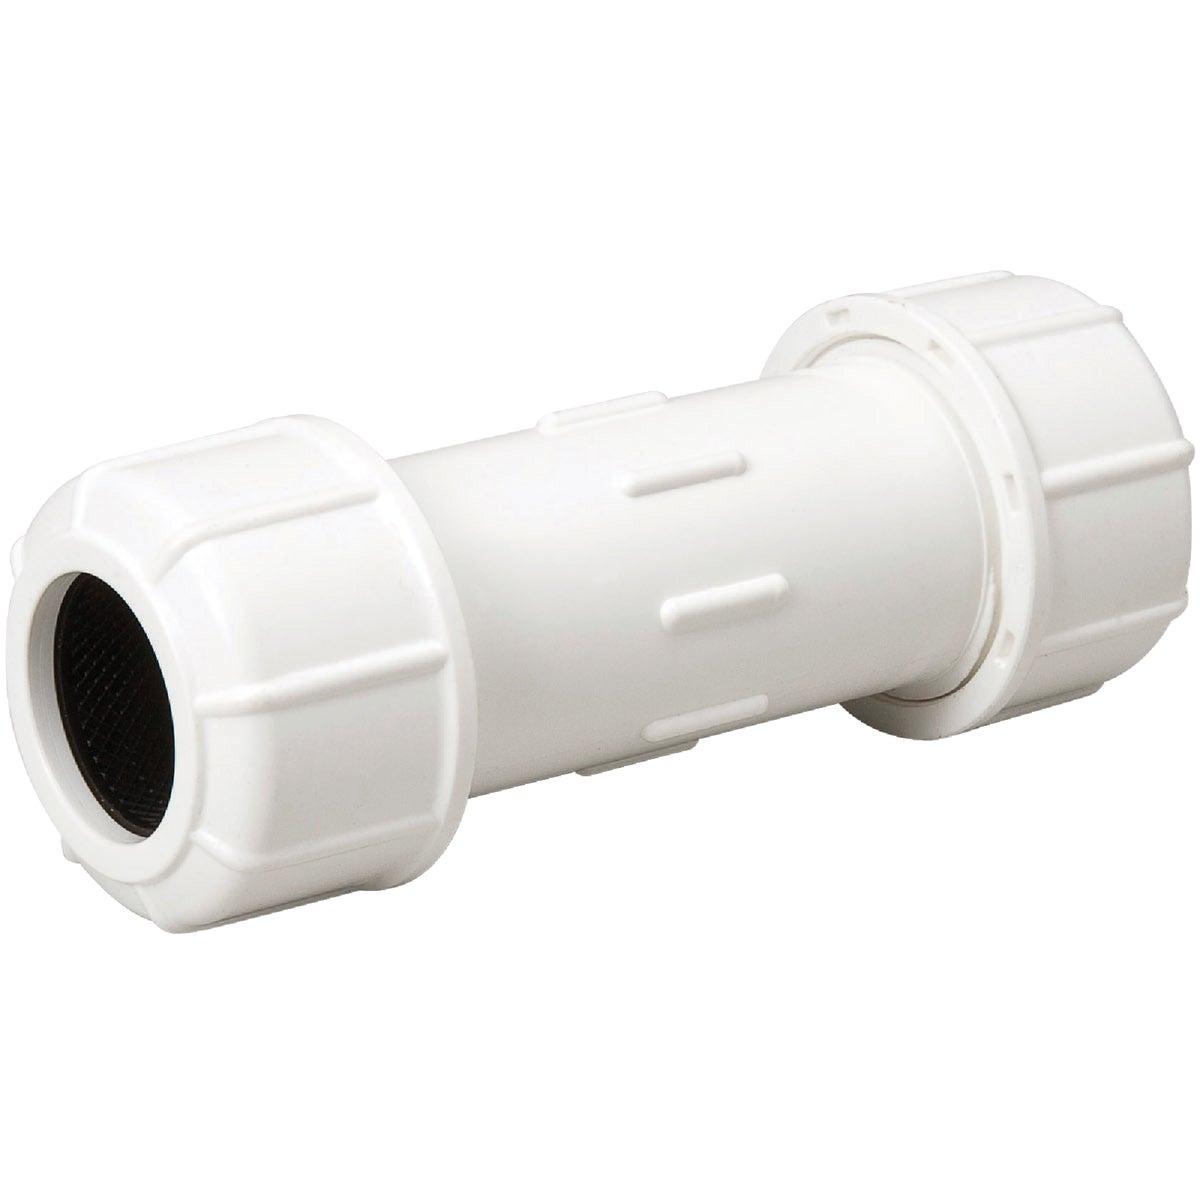 1/2X5 PVC COUPLING - 160-103 by Mueller B K